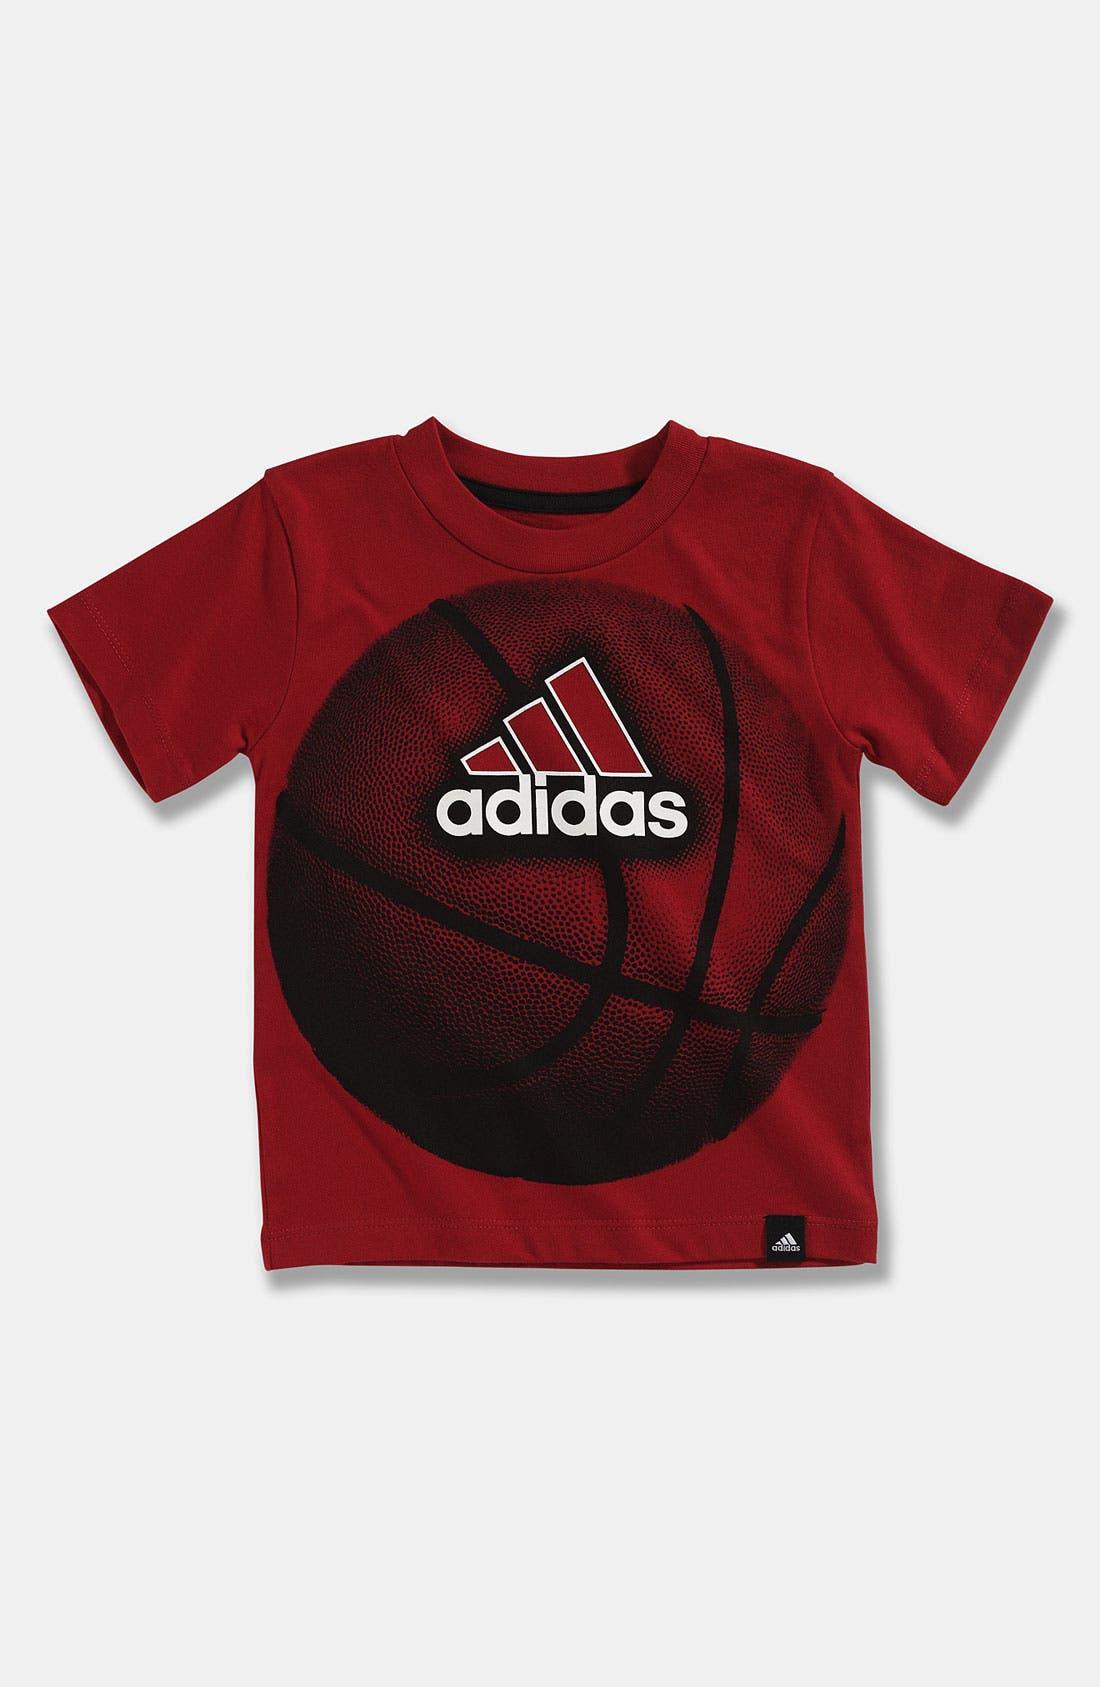 Main Image - adidas 'Big Ball' T-Shirt (Toddler)